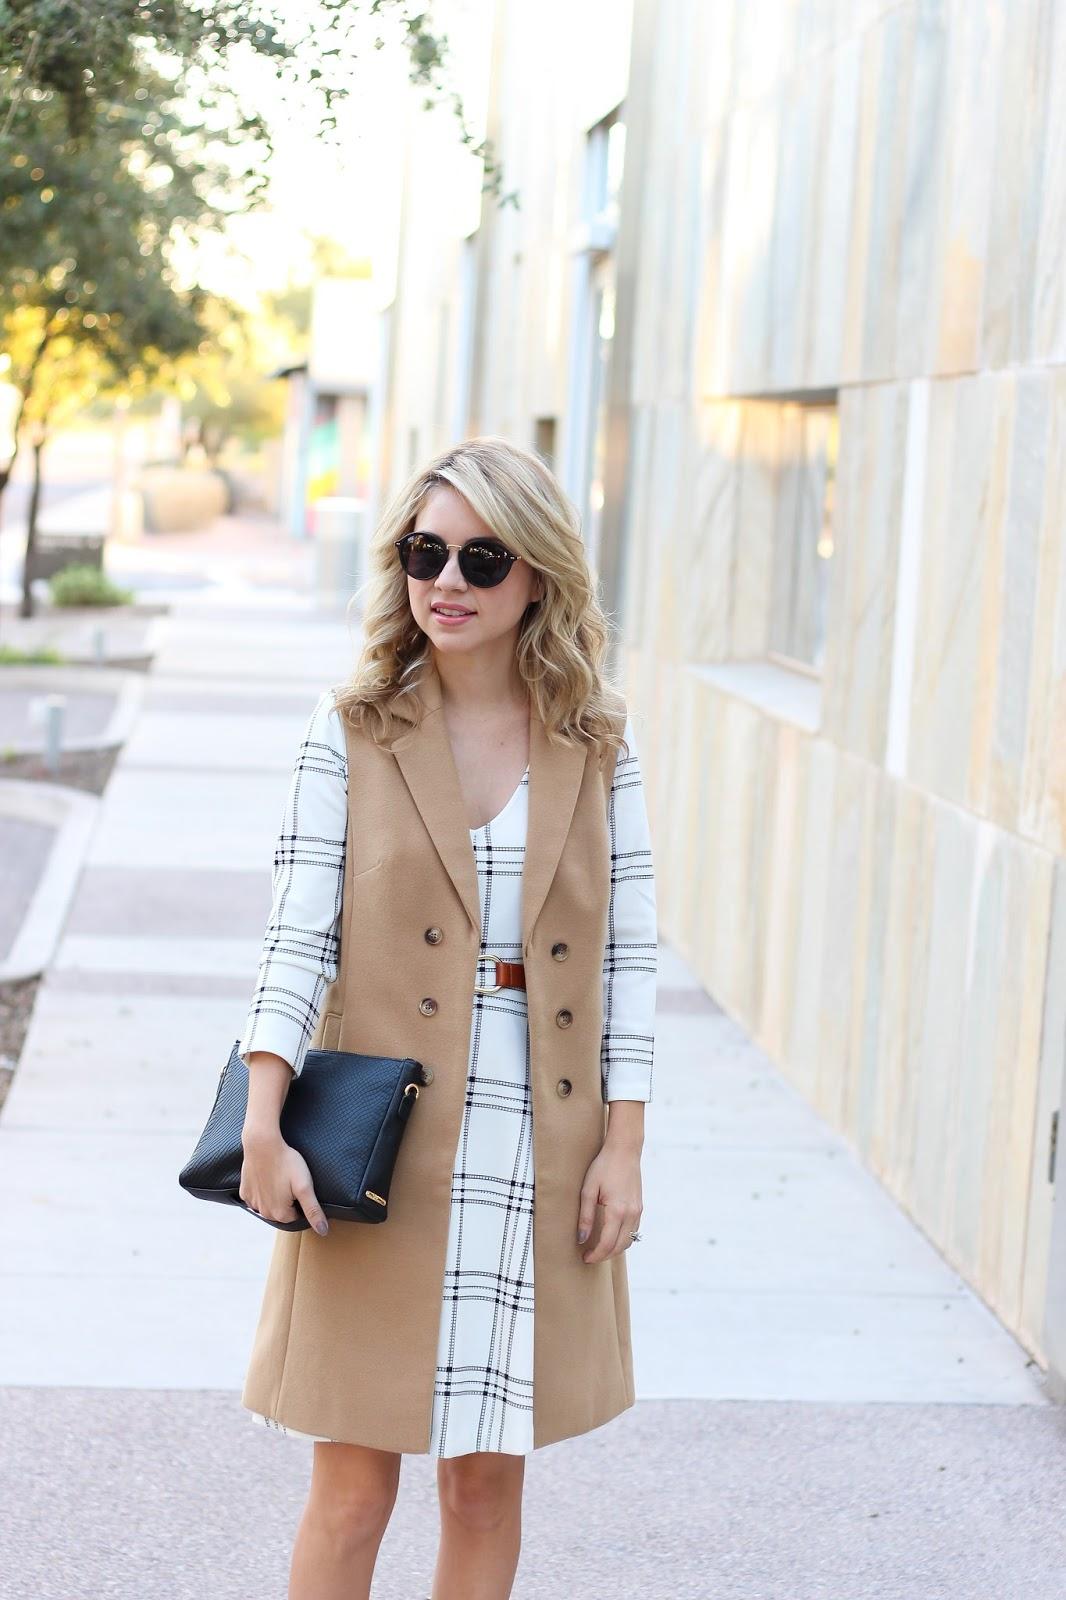 style - LBC - Trench Vest - plaid dress - simply sutter - look book